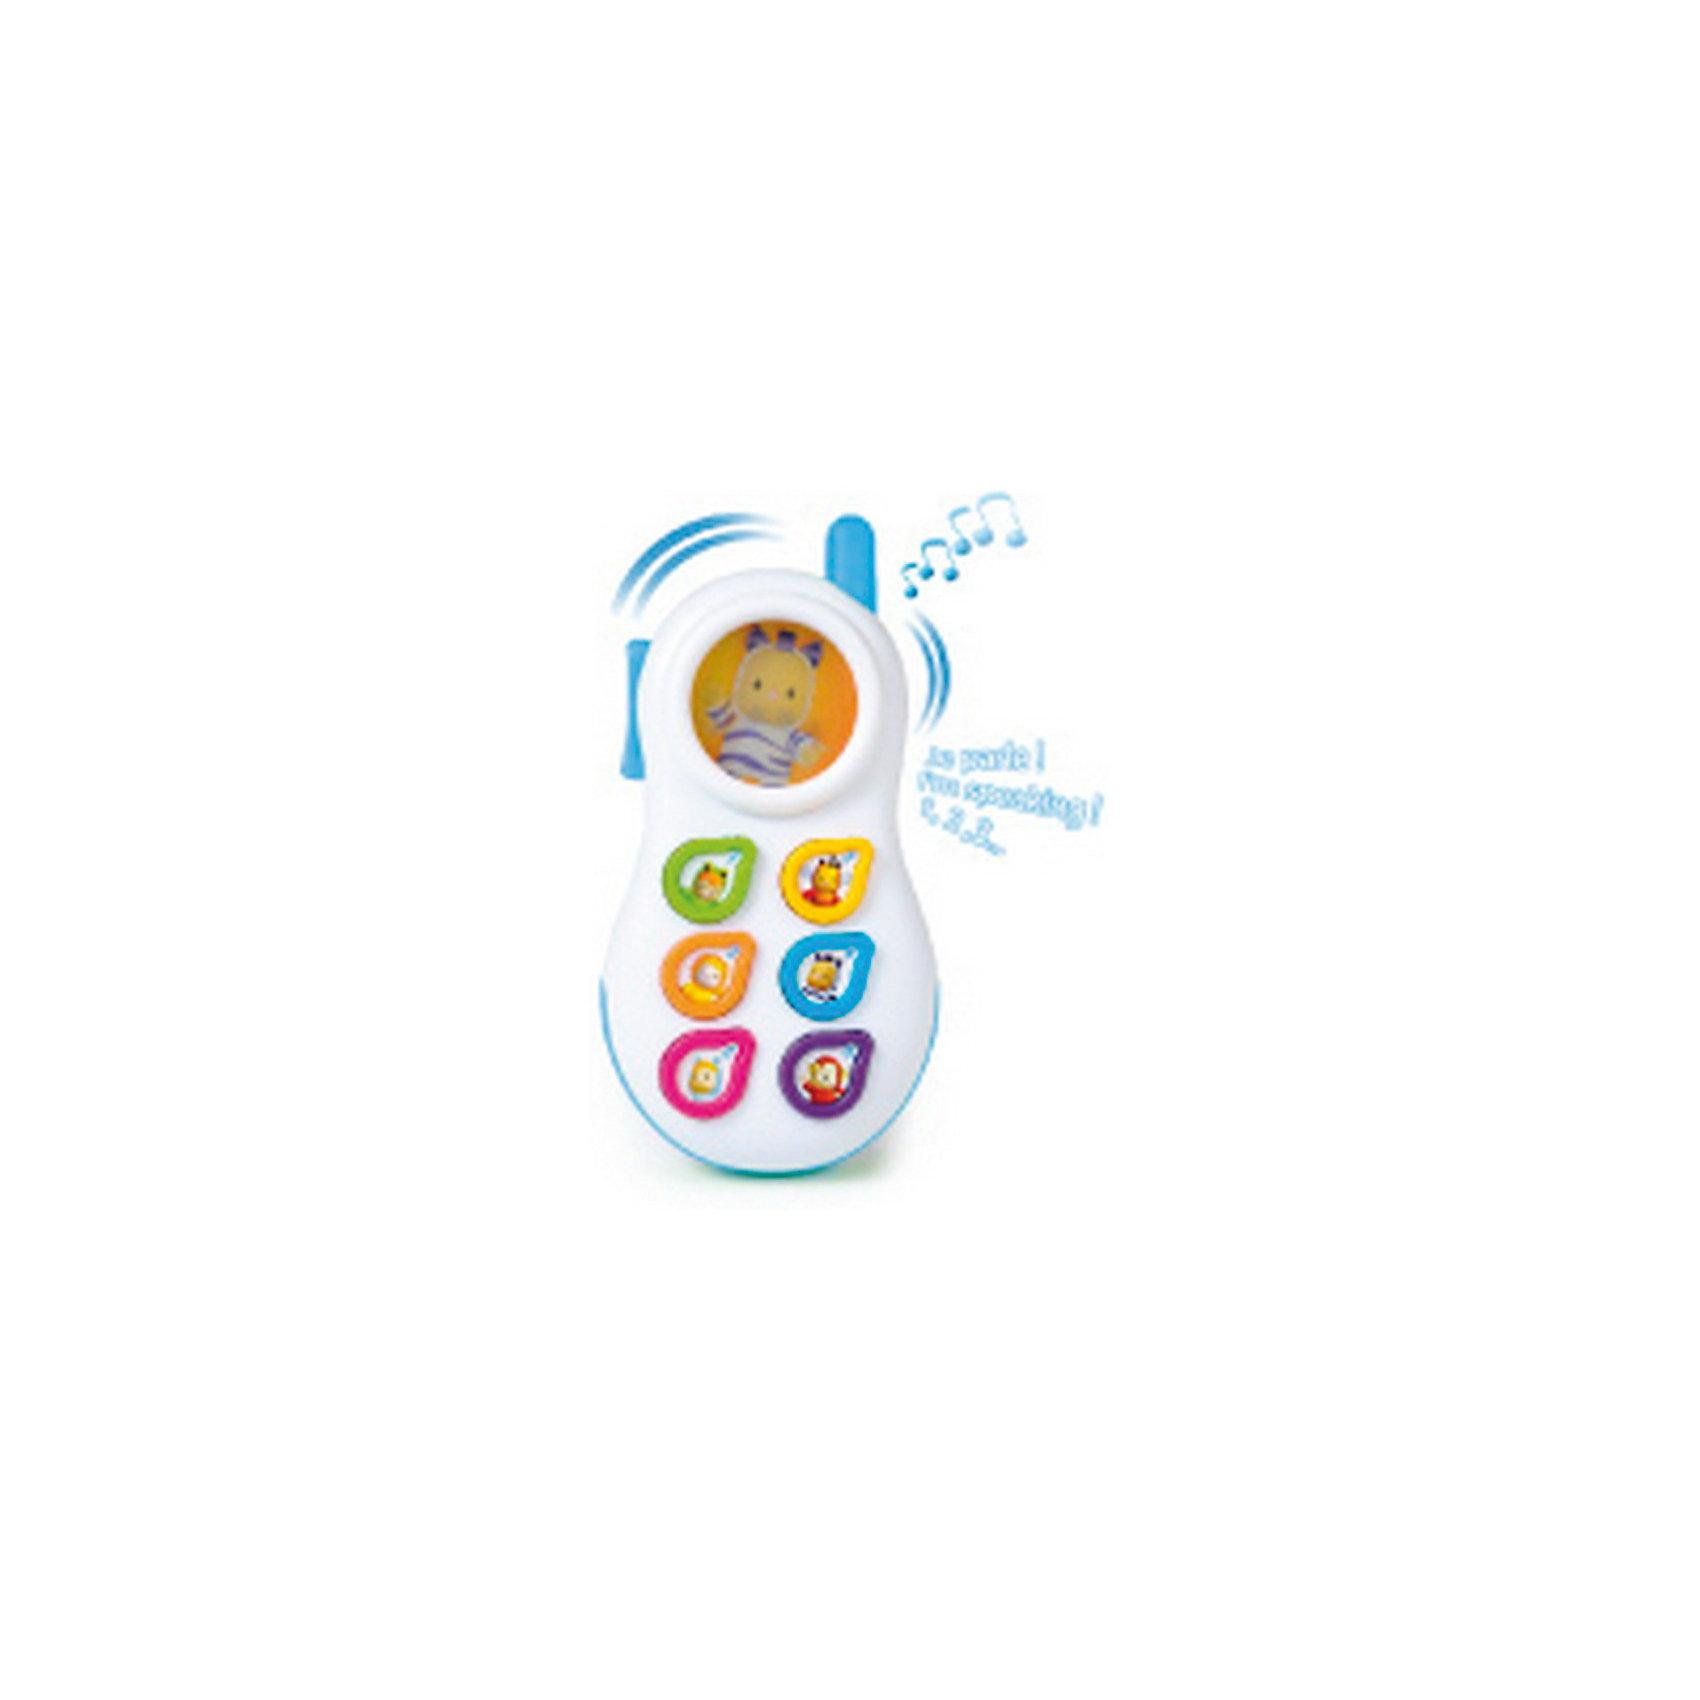 Smoby Smoby Cotoons Телефон со светом и звуком погремушка калейдоскоп smoby cotoons